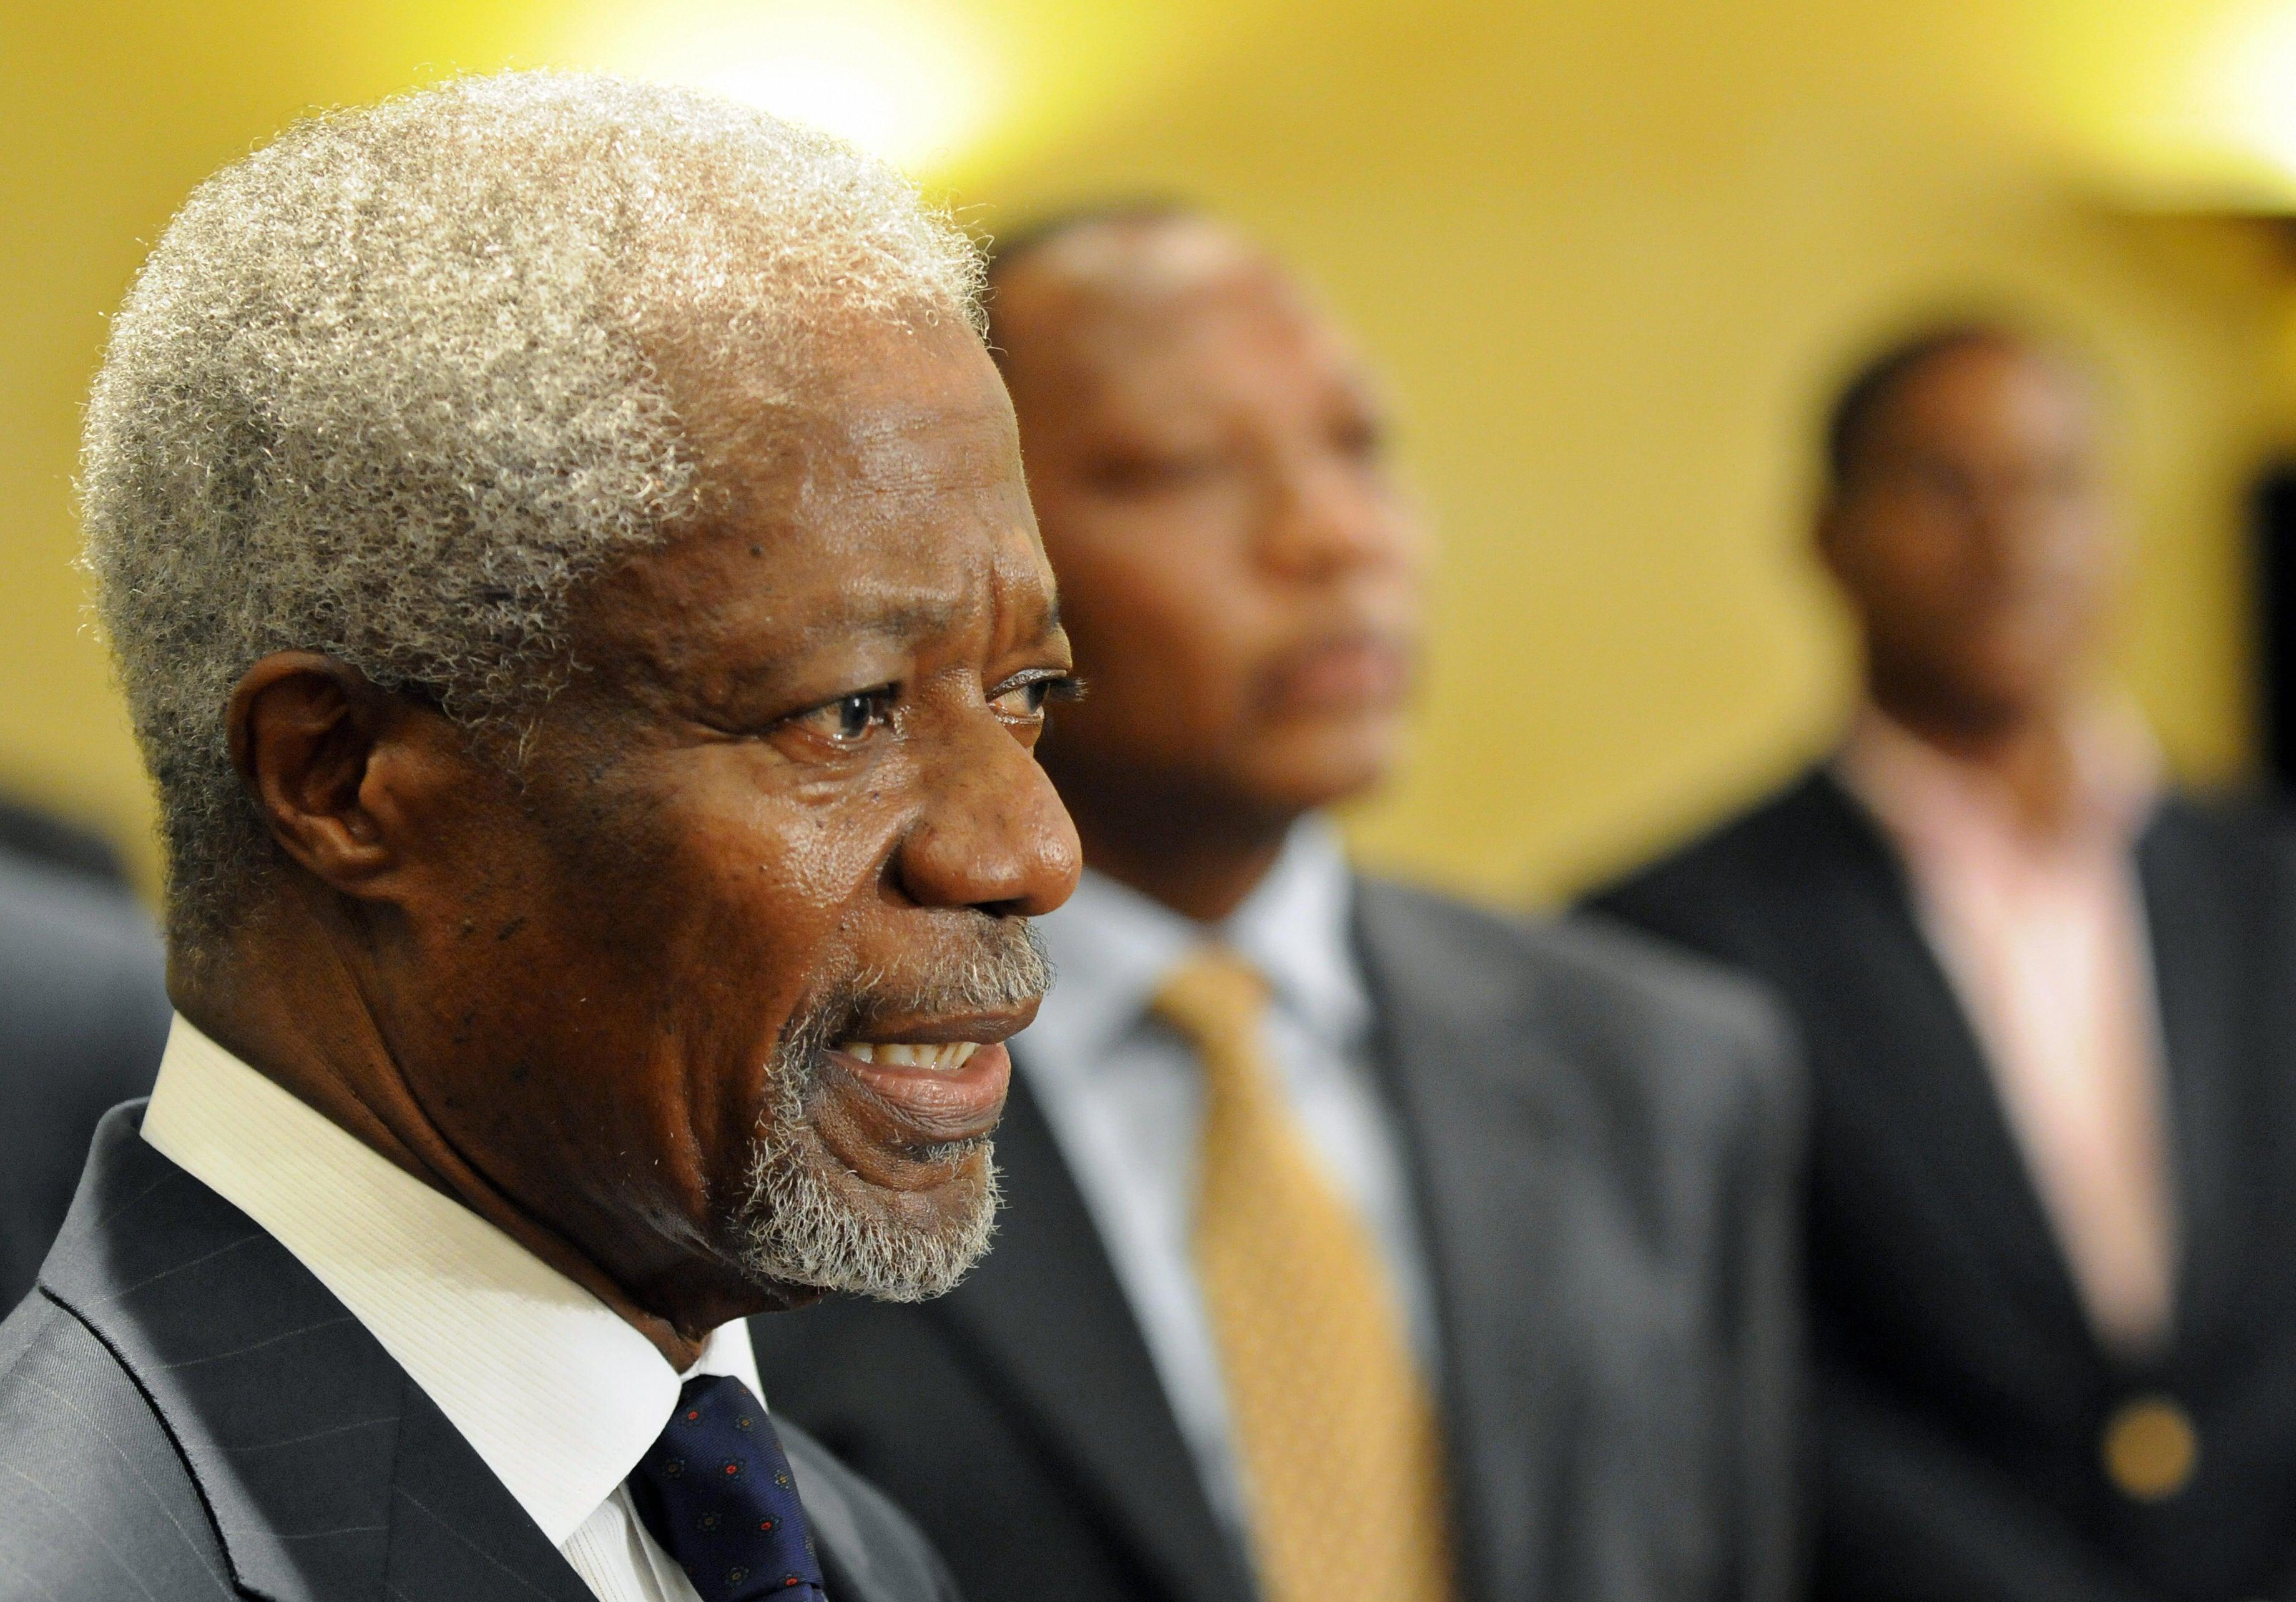 Kofi Annan, First Black U.N. Secretary-General, Has Died